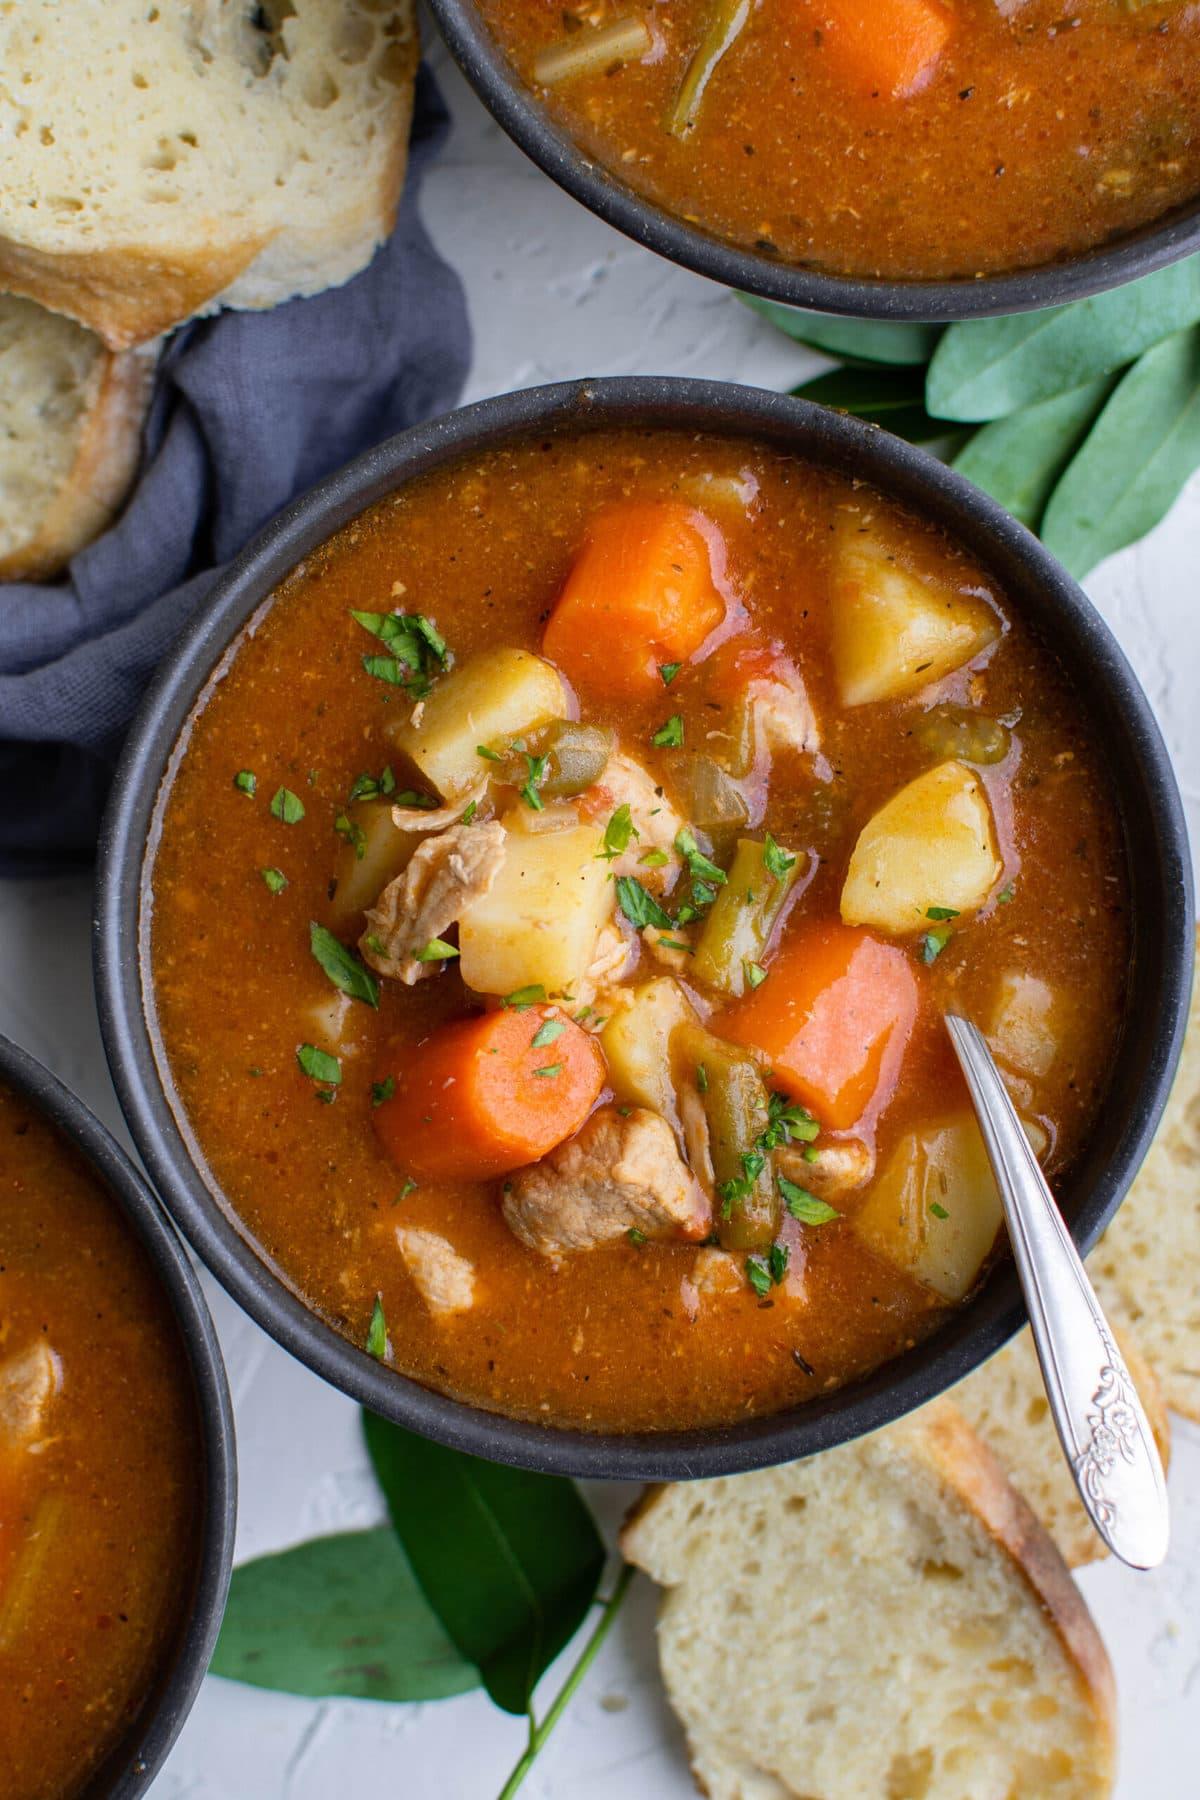 black bowls, potatoes, pork, carrots, blue napkin, bay leaves, bread